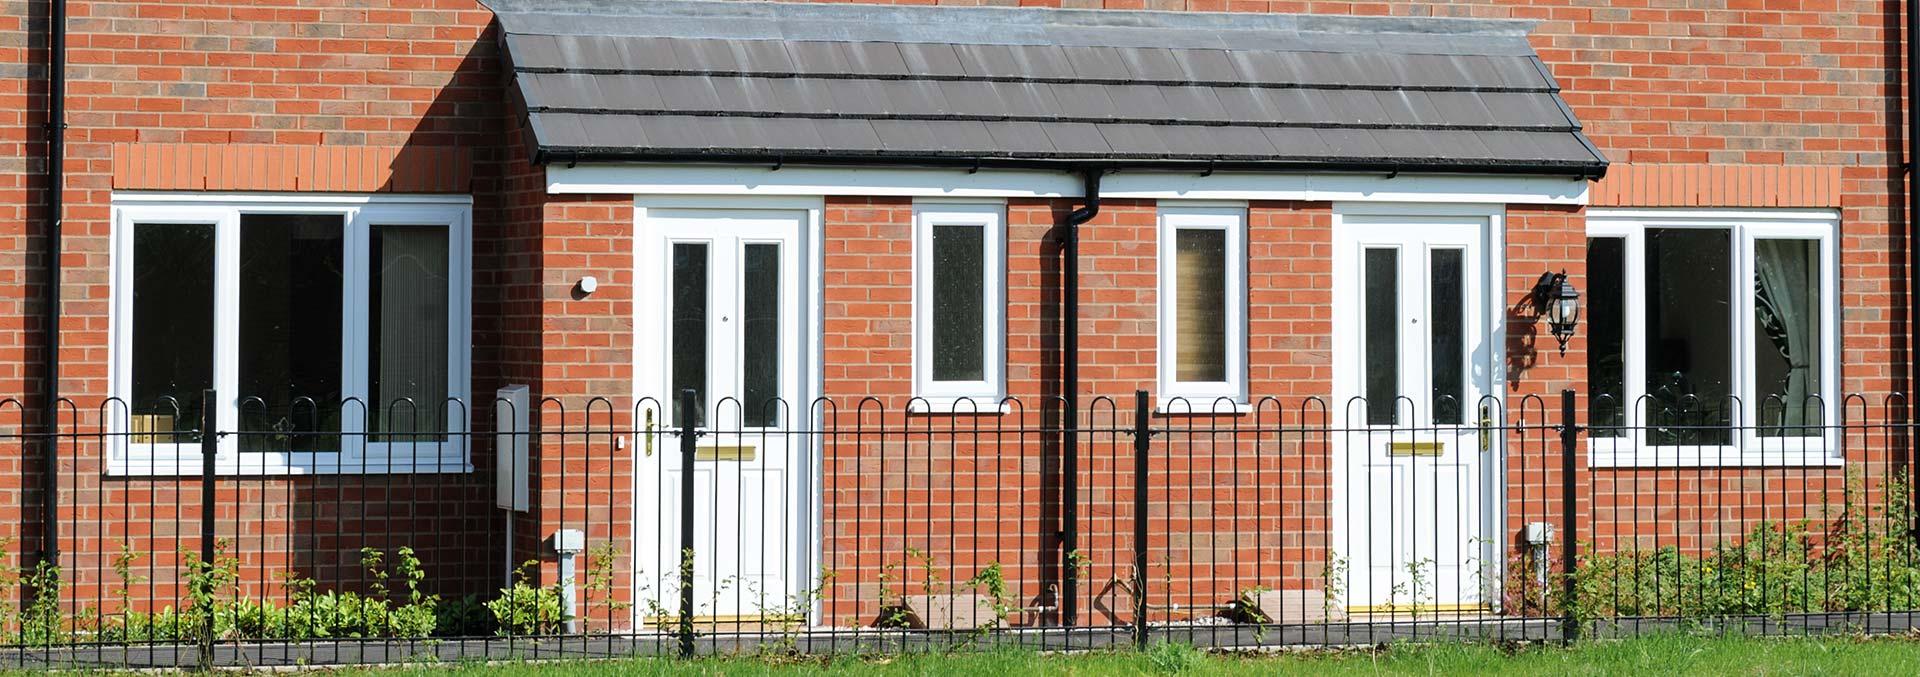 Brick porch with white entrance door